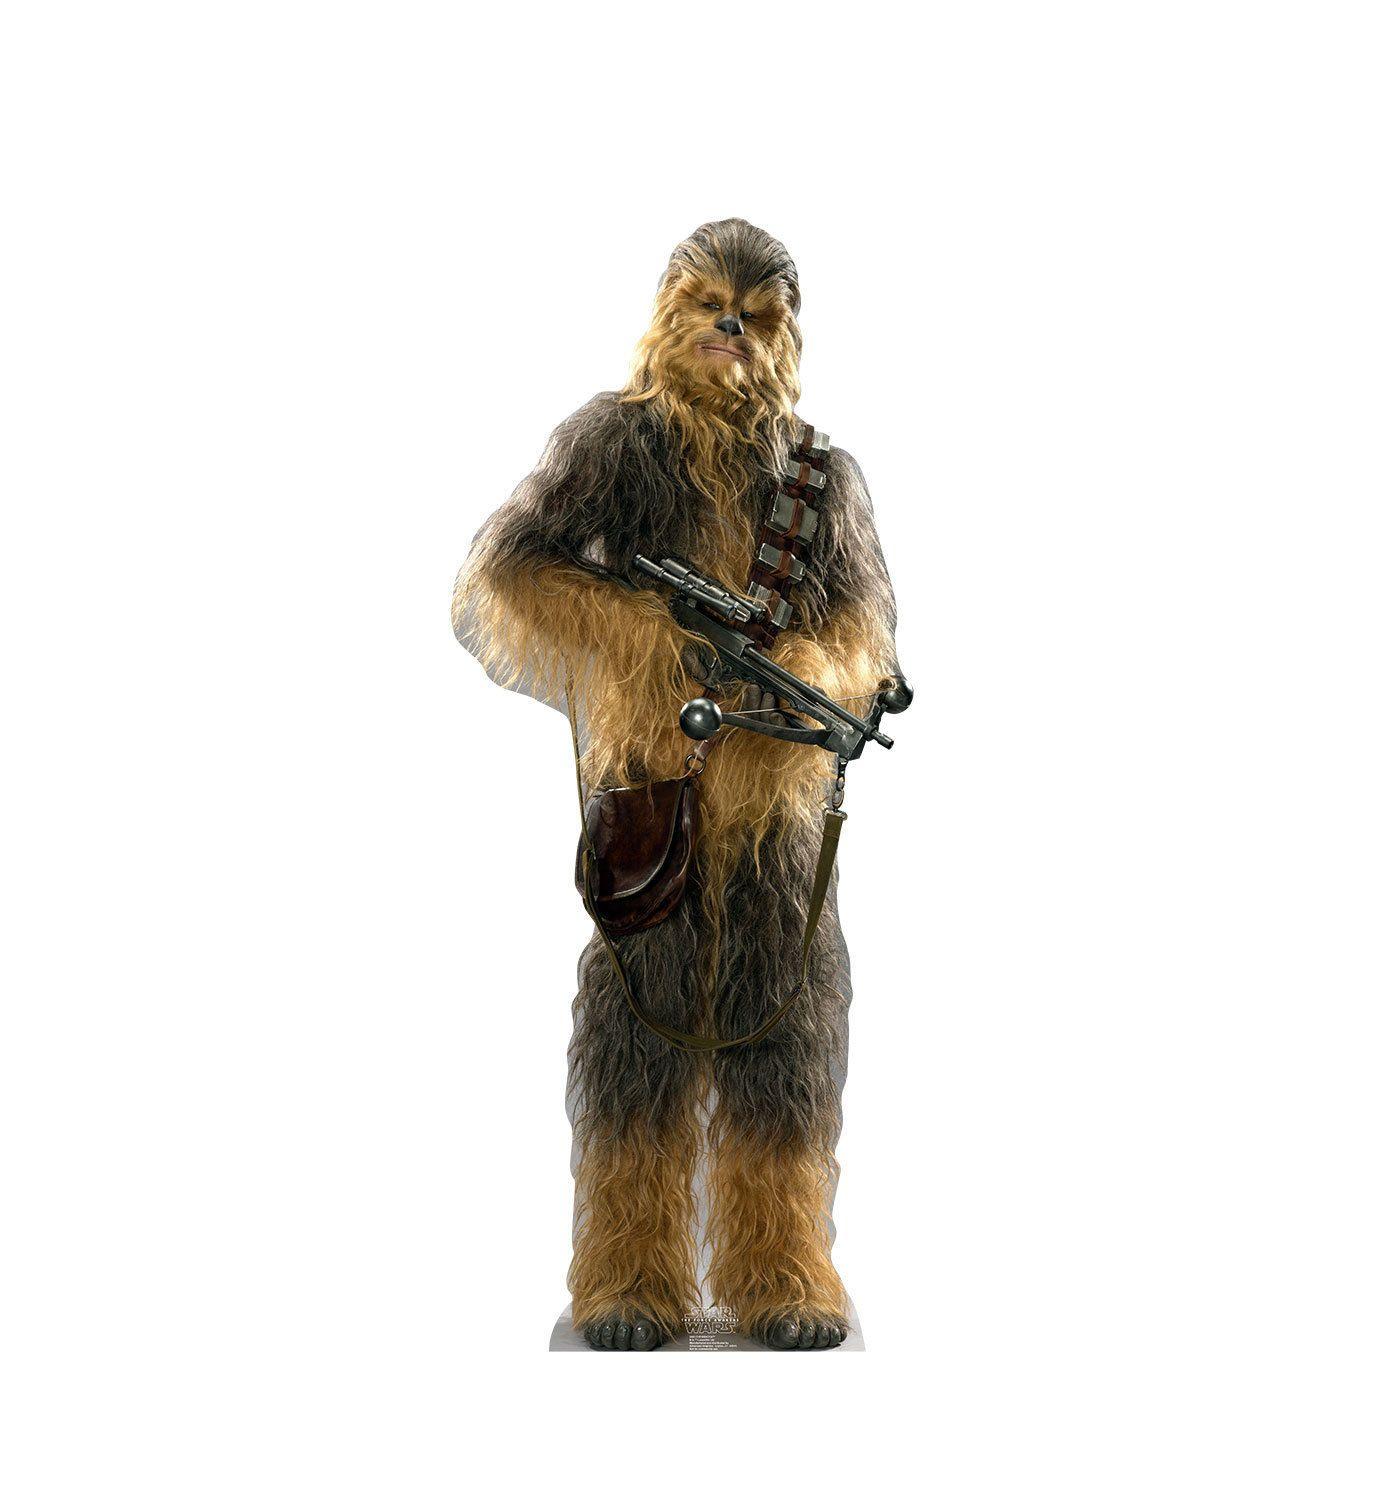 Hi-Res Image: Chewbacca